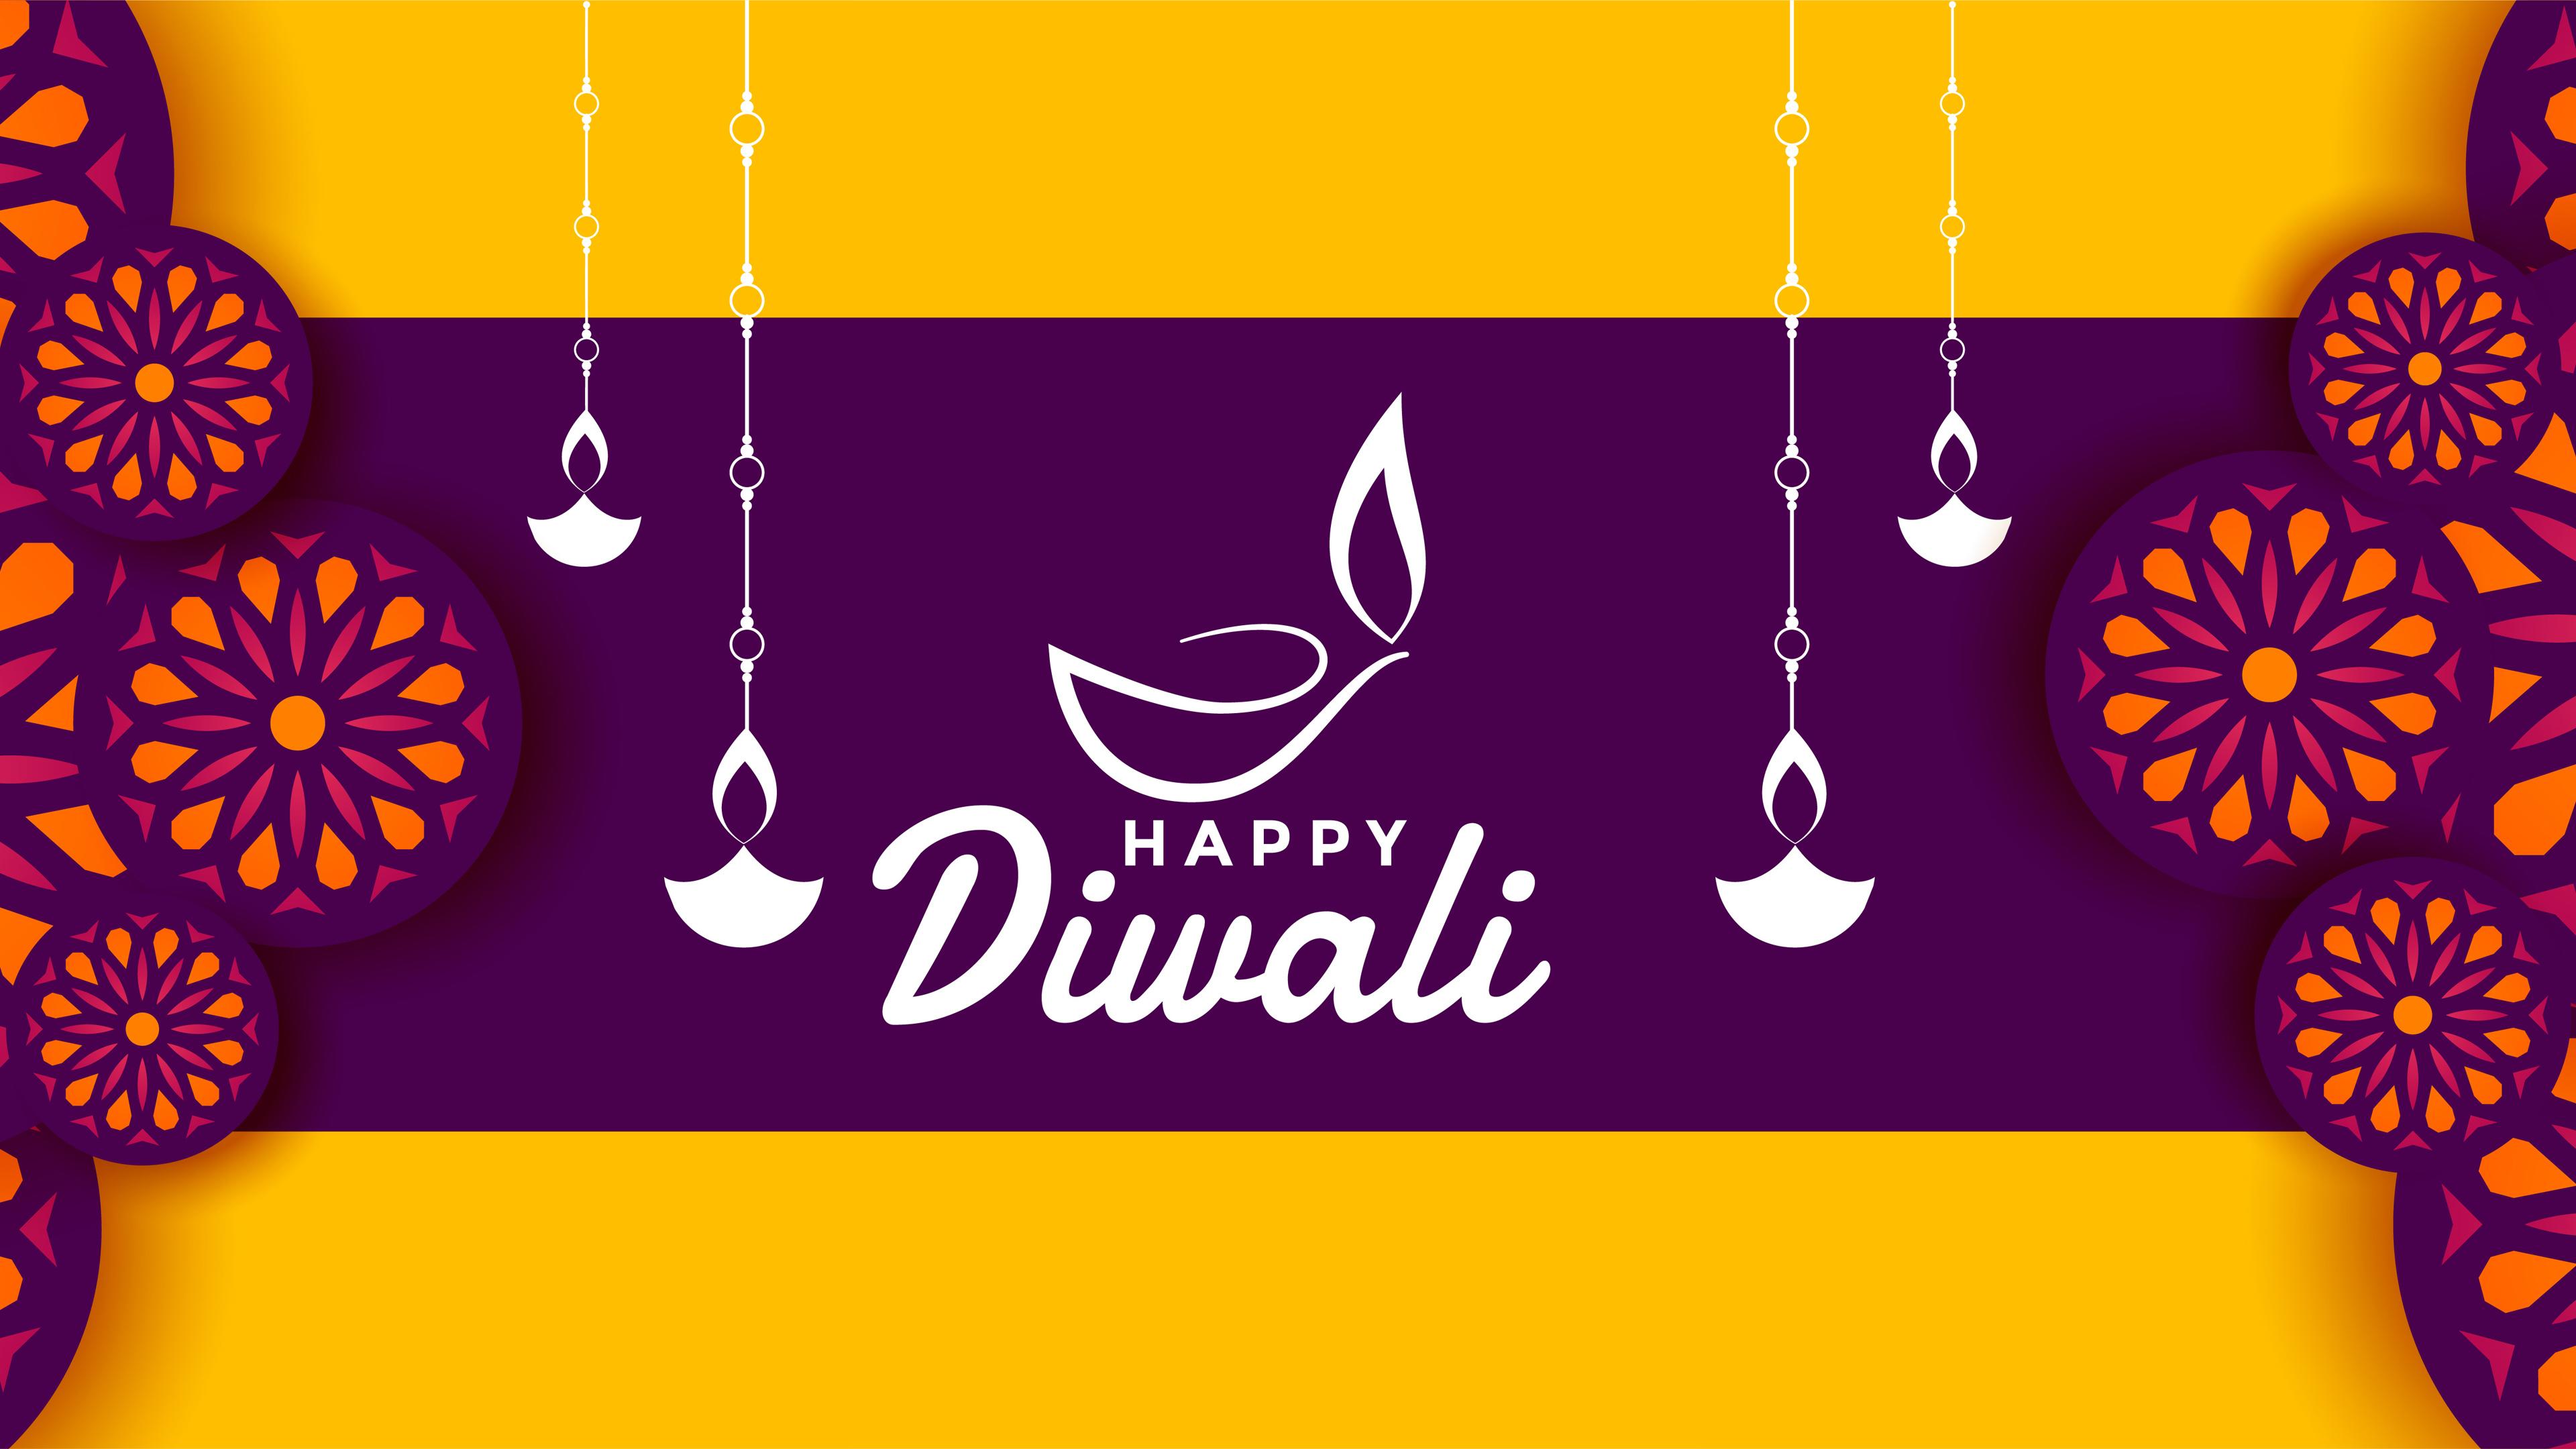 Indian Festival Diwali 2020 4K Wallpaper   HD Wallpapers